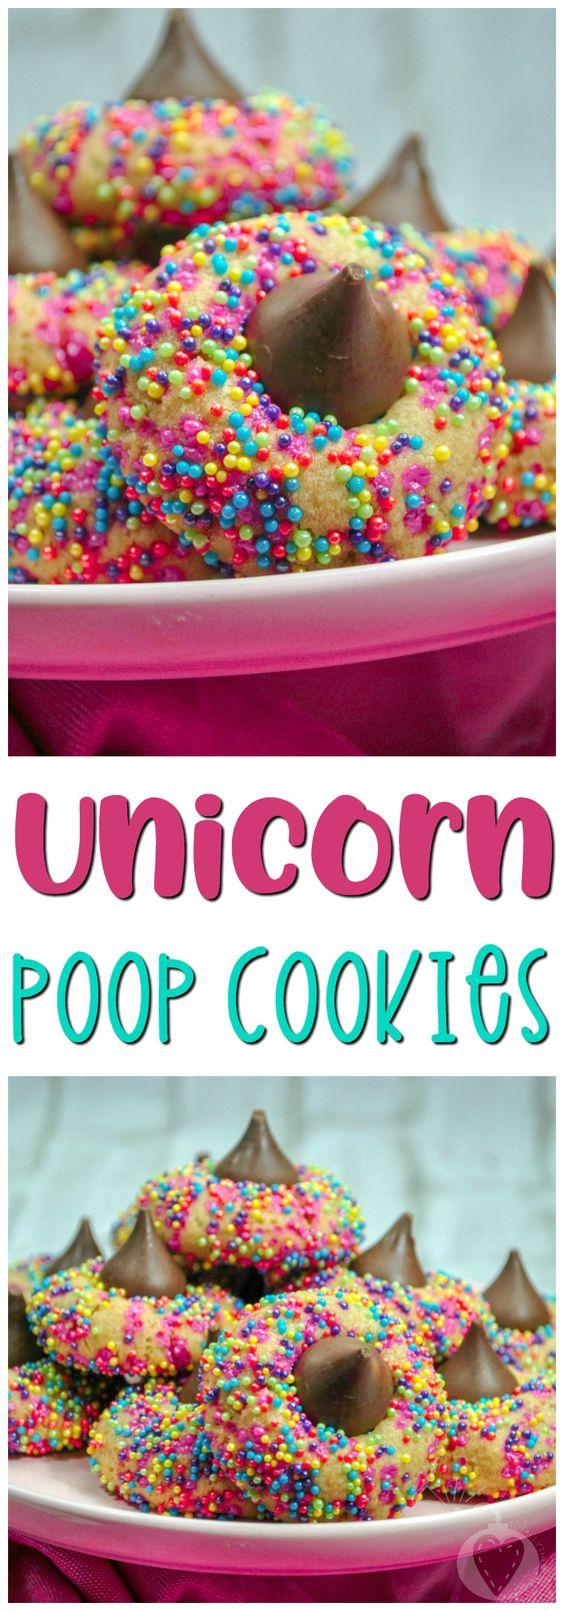 Unicorn desserts for a unicorn party: Unicorn Poop Drop Cookies